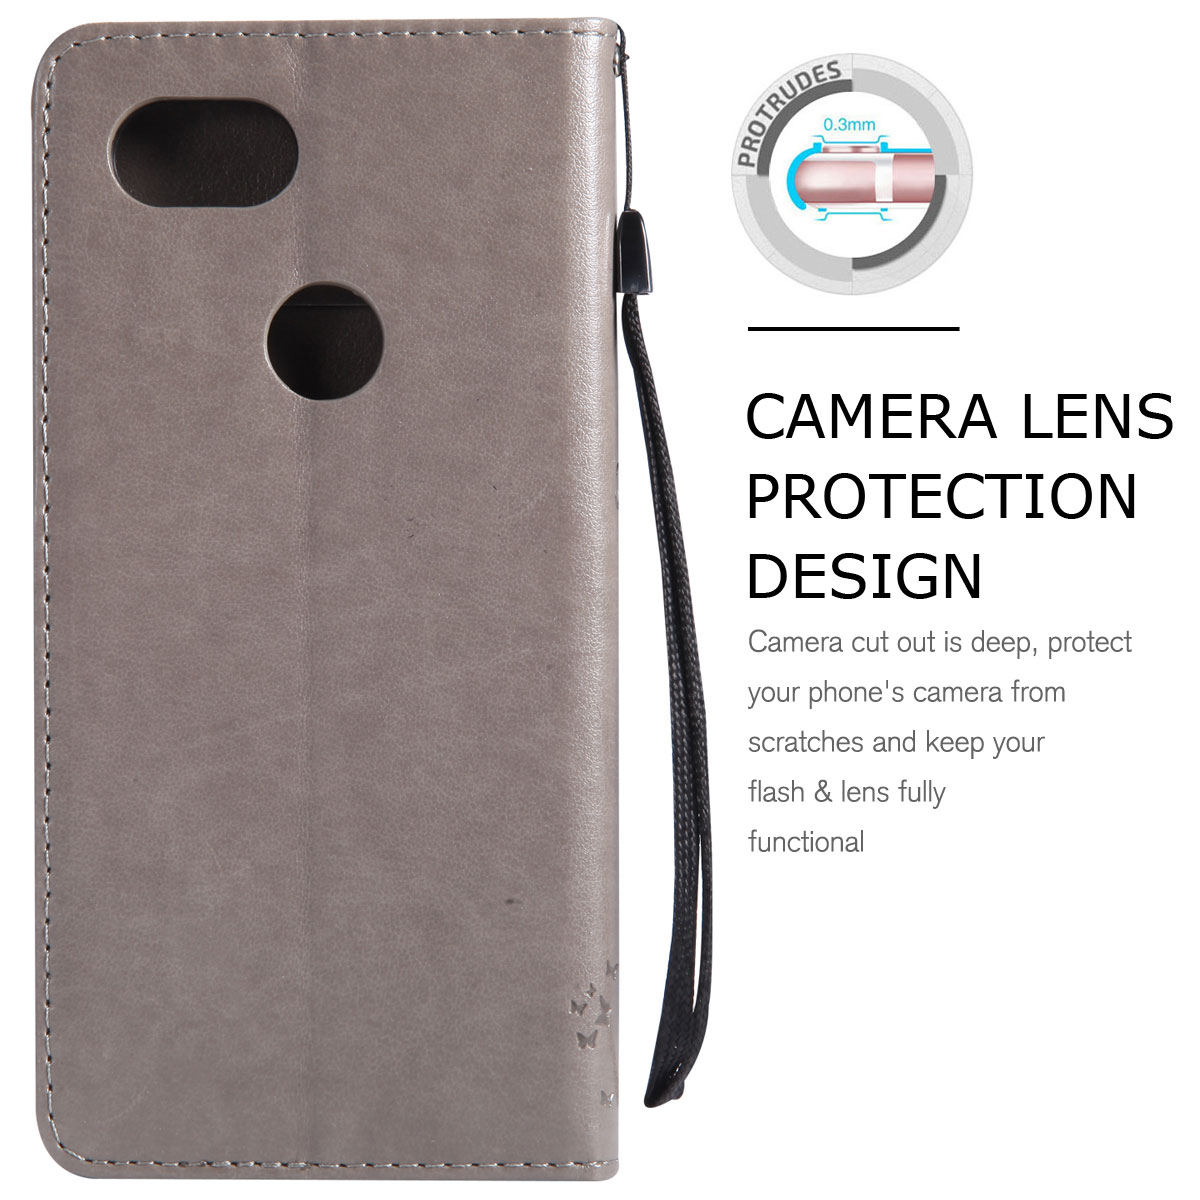 Magnetic-Leather-Credit-Card-Holder-Flip-Case-Cover-For-Google-Pixel-2-2-XL thumbnail 35